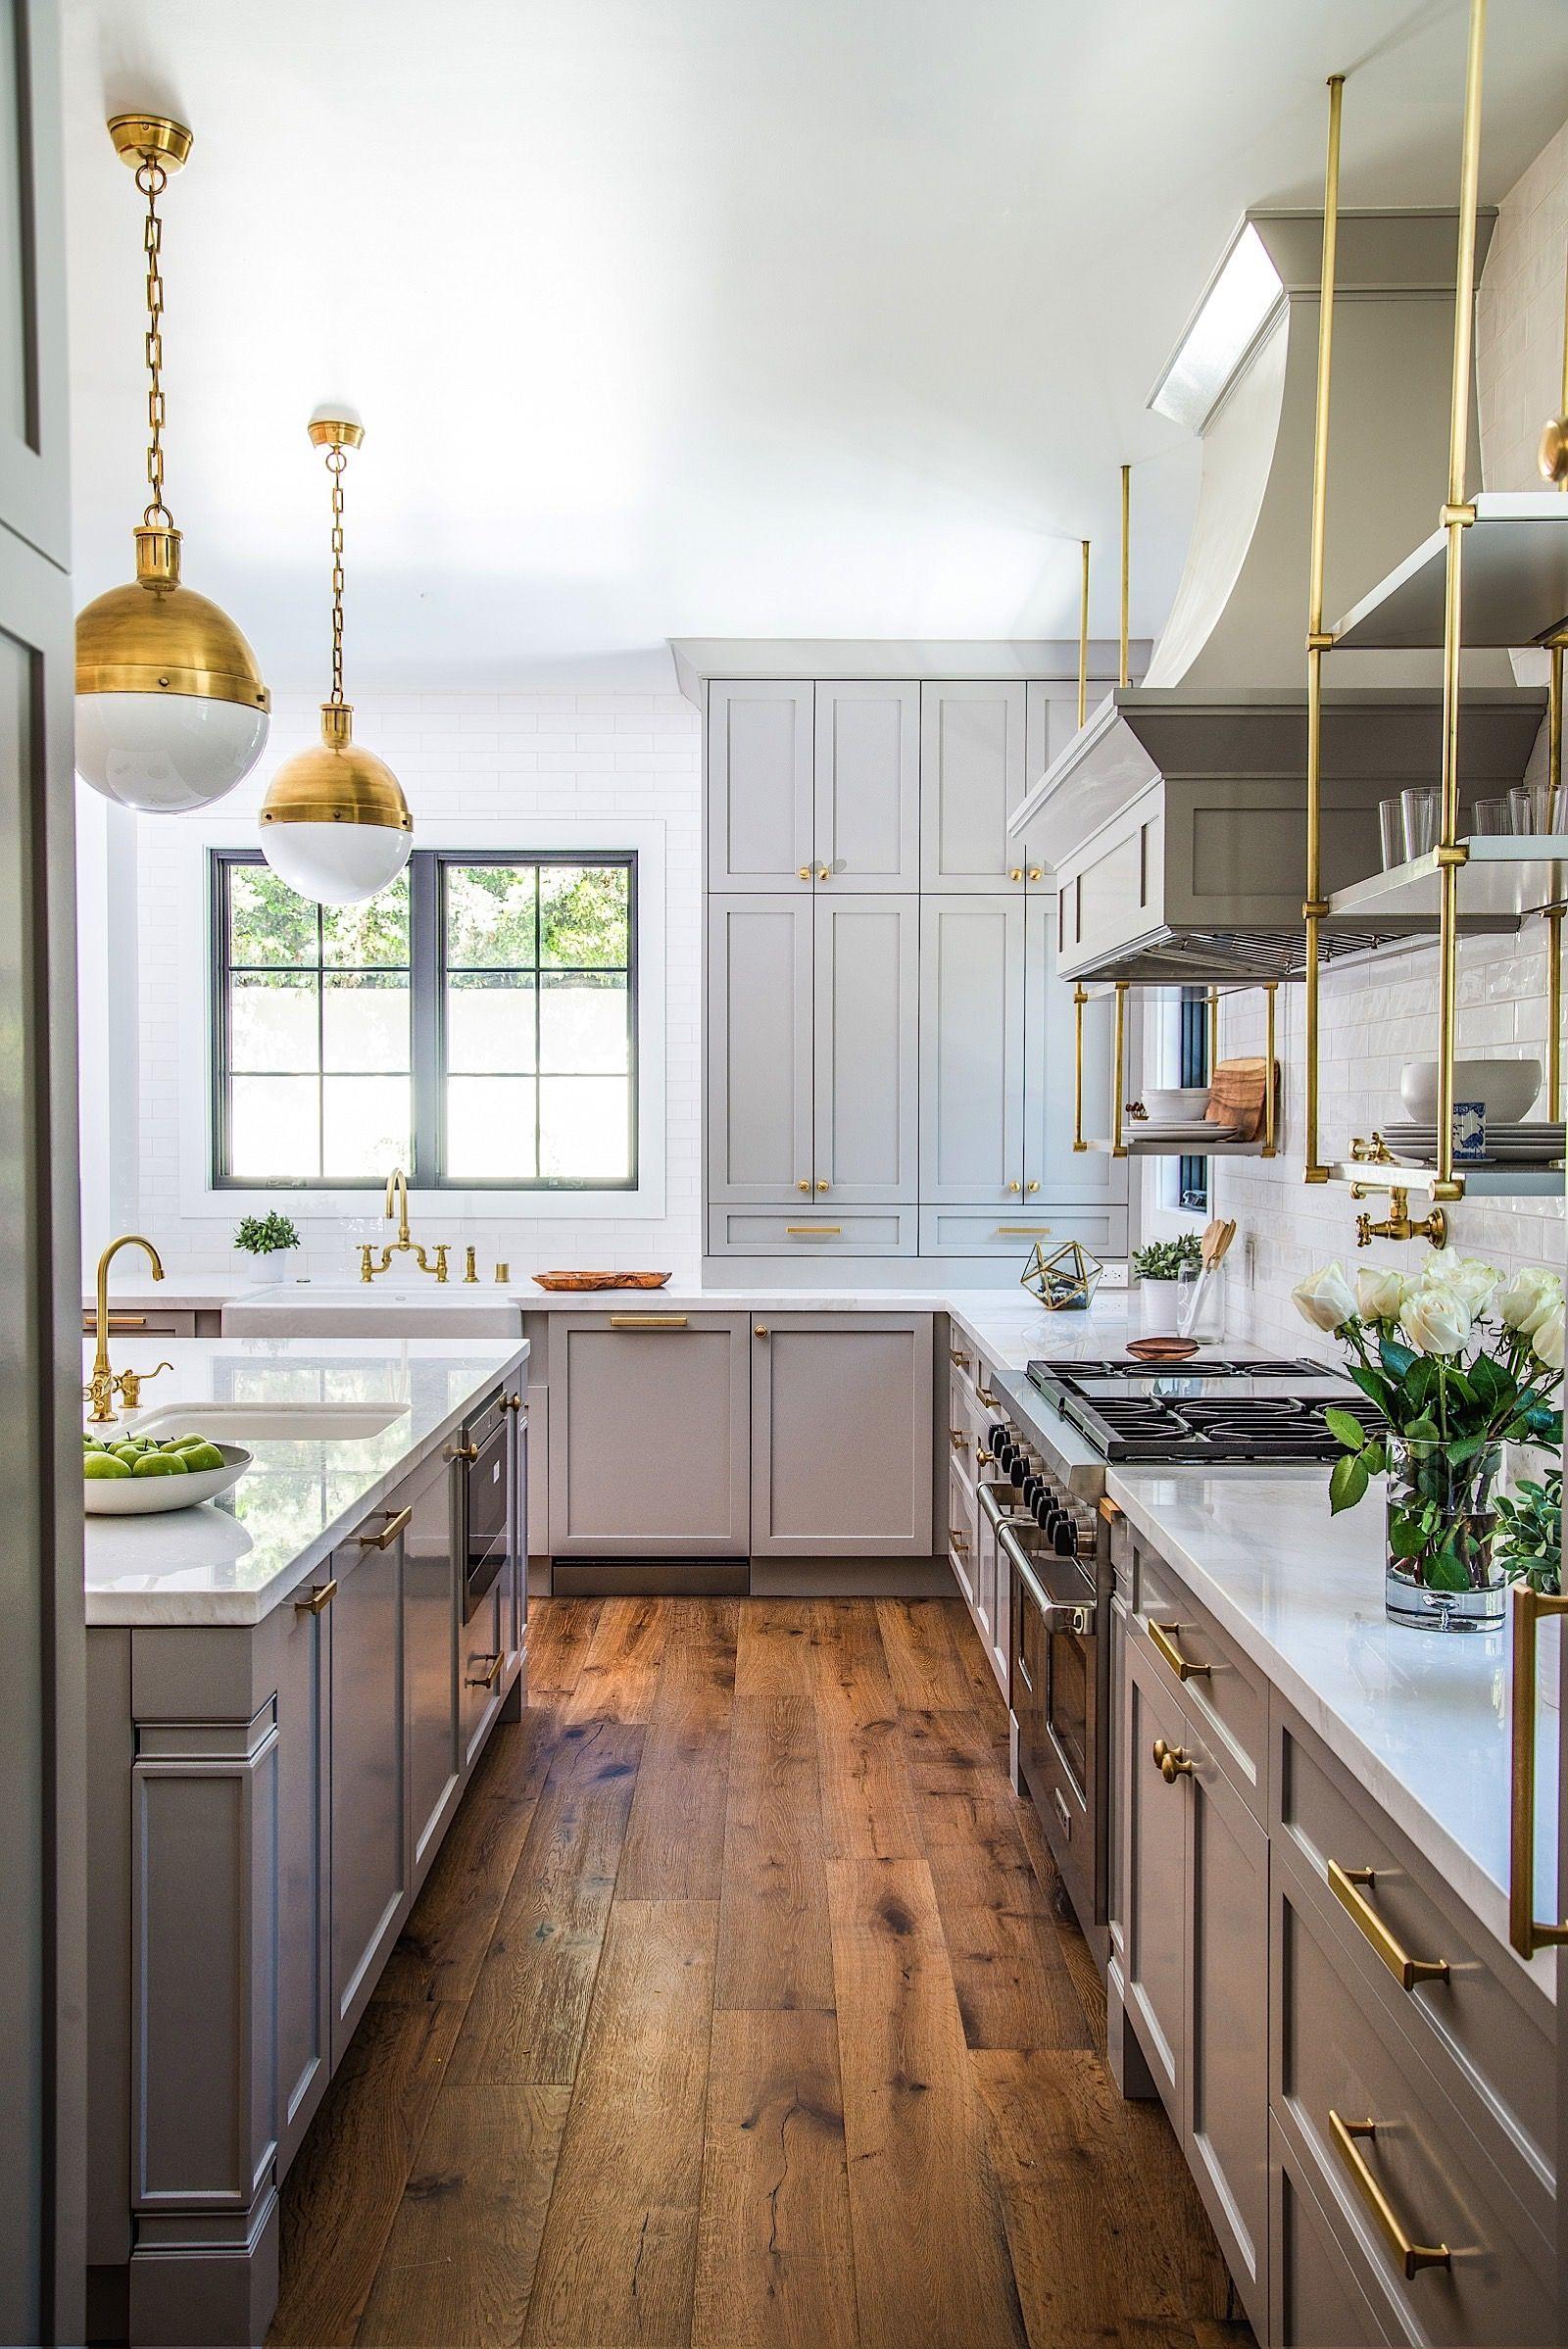 Brass Accents Grey Cabinets Modern Cape Cod Kitchen At Bundy In Brentwood Built By Boswell Construction Visit Kuchenboden Kuchenrenovierung Kuchendesign